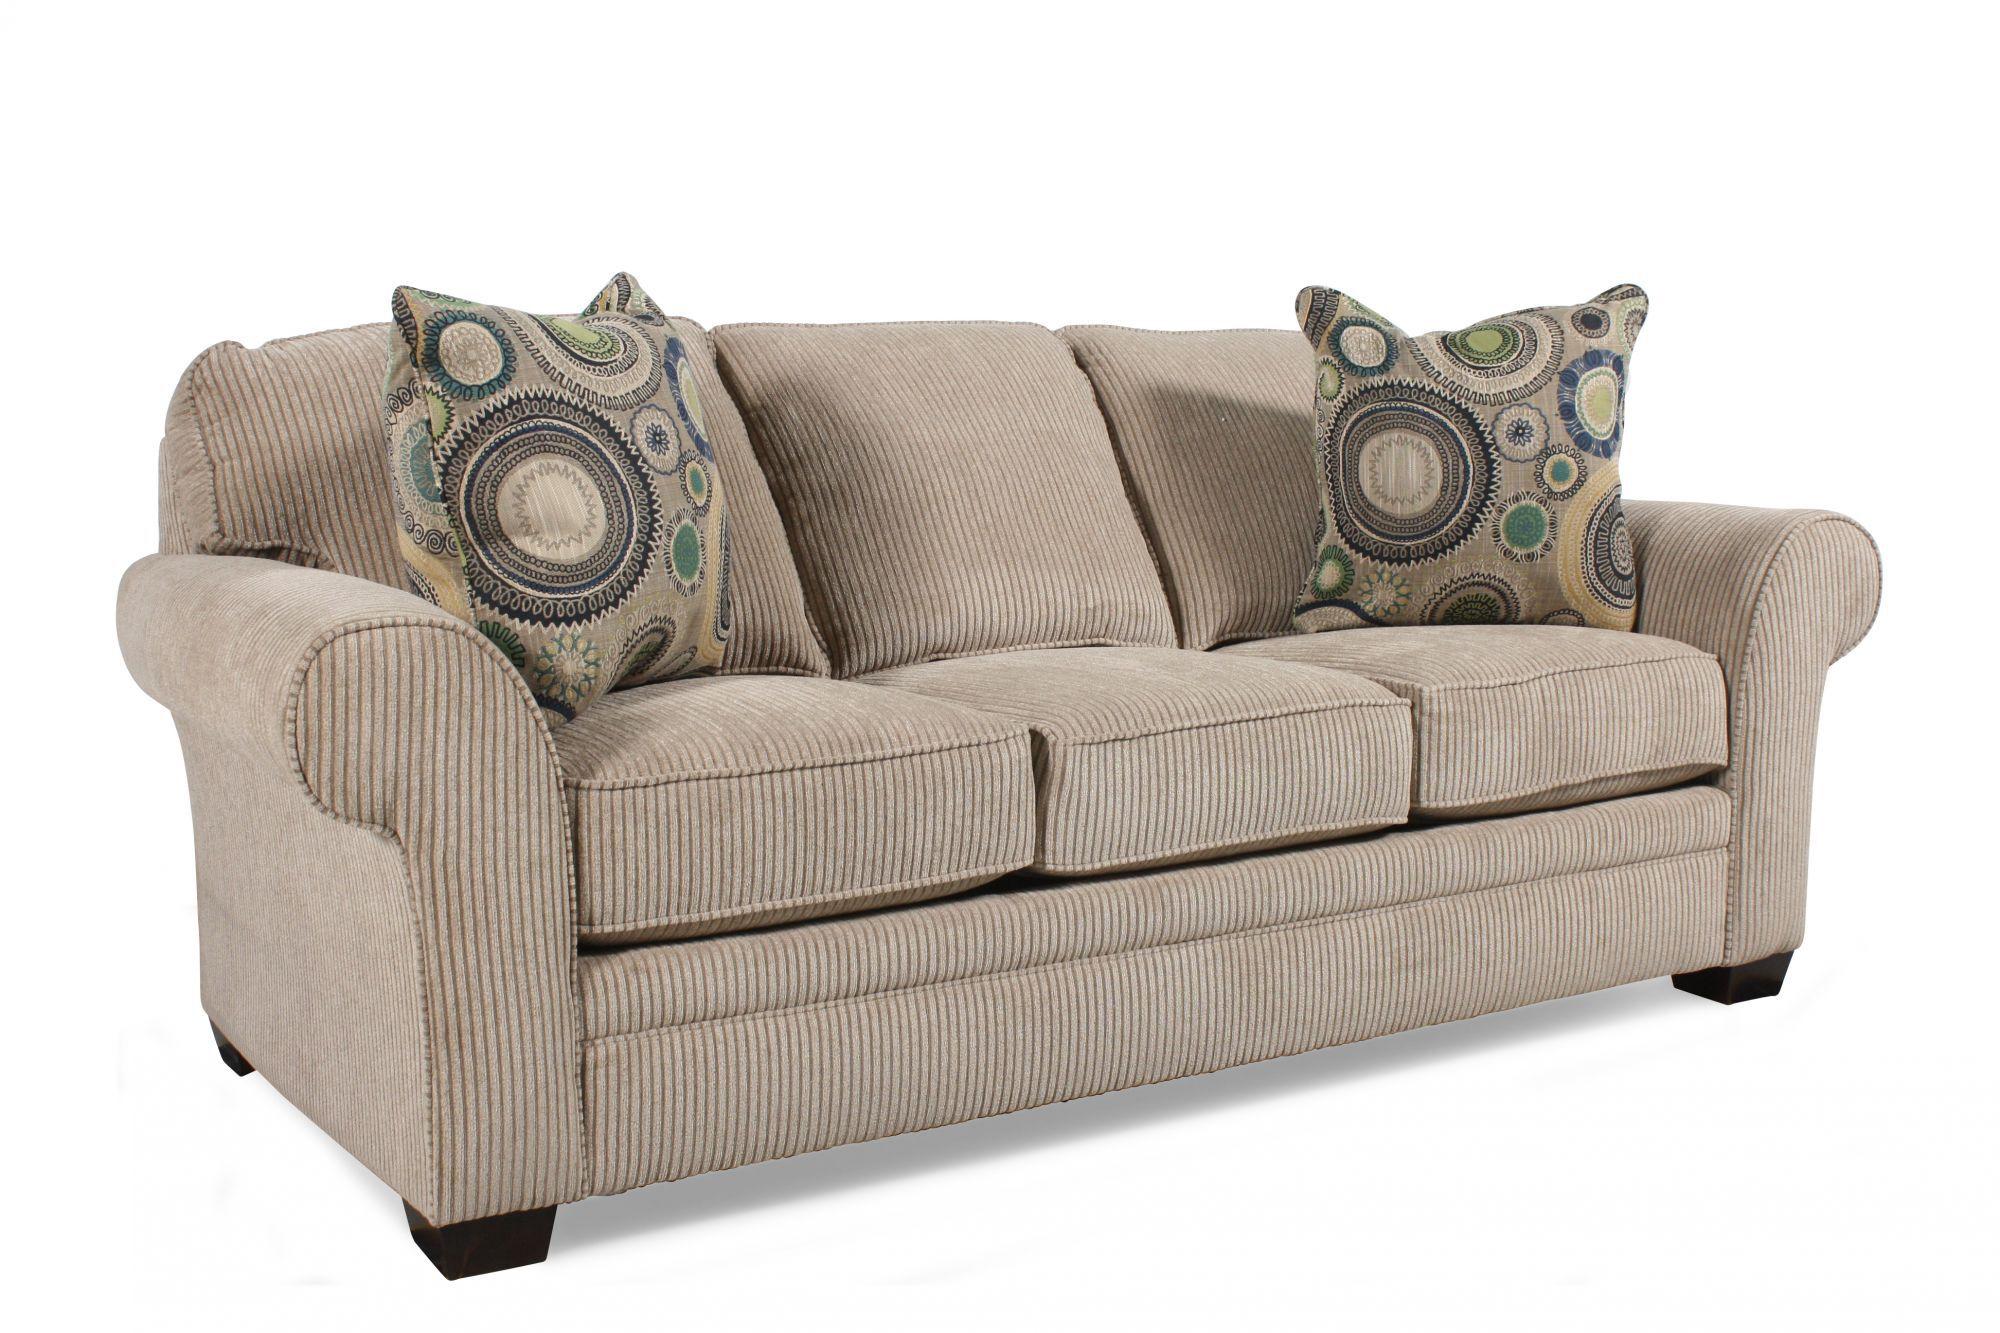 72 sleeper sofa macys sectional handcrafted rolled arm quot queen in sandstone